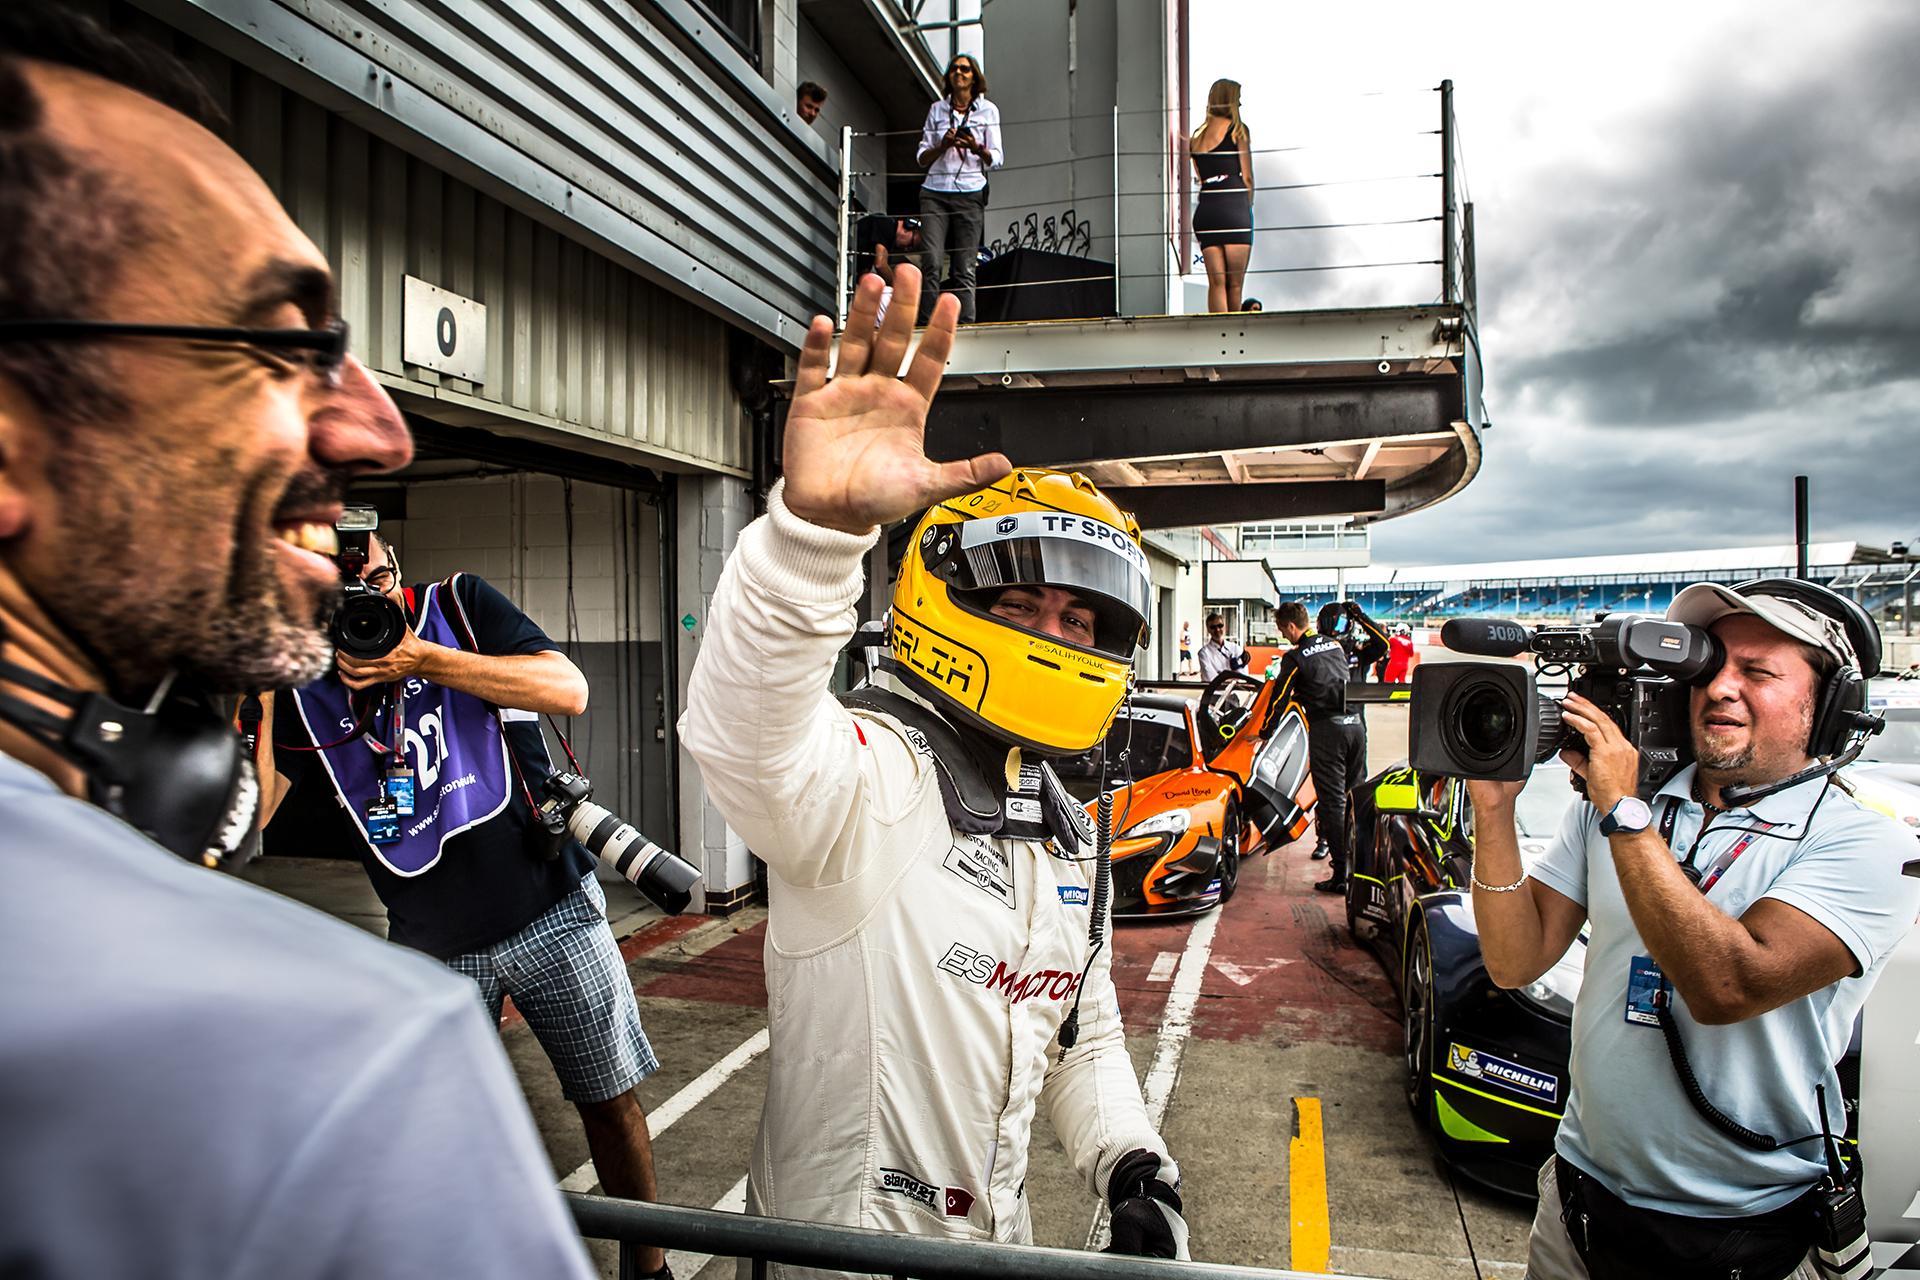 2016-IntGTOpen- Silverstone-50793.jpg